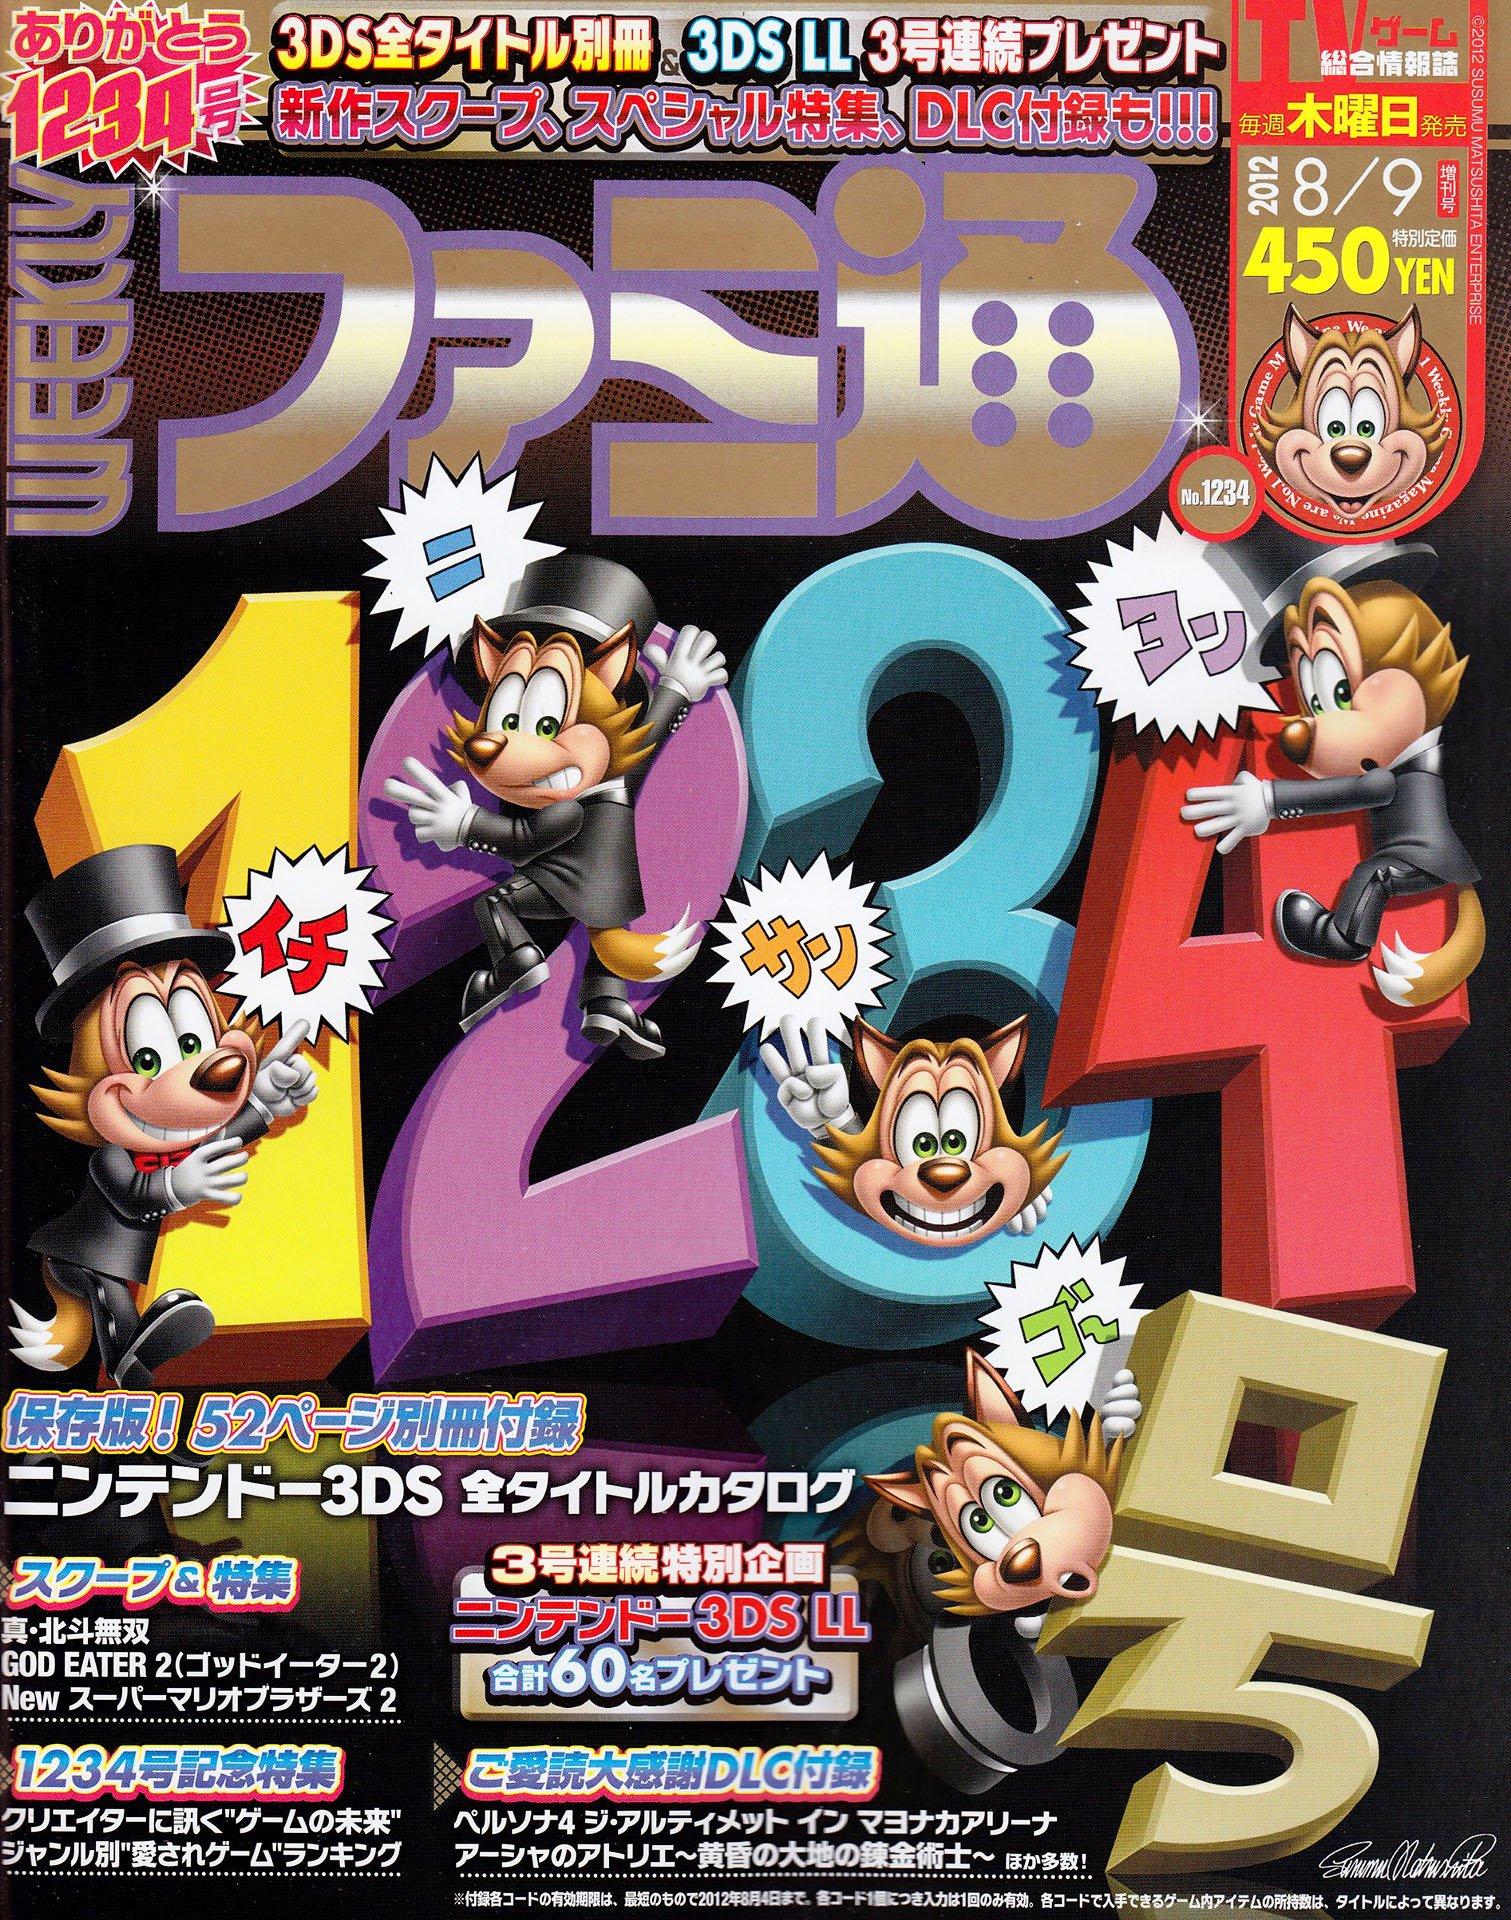 Famitsu 1234 August 9, 2012